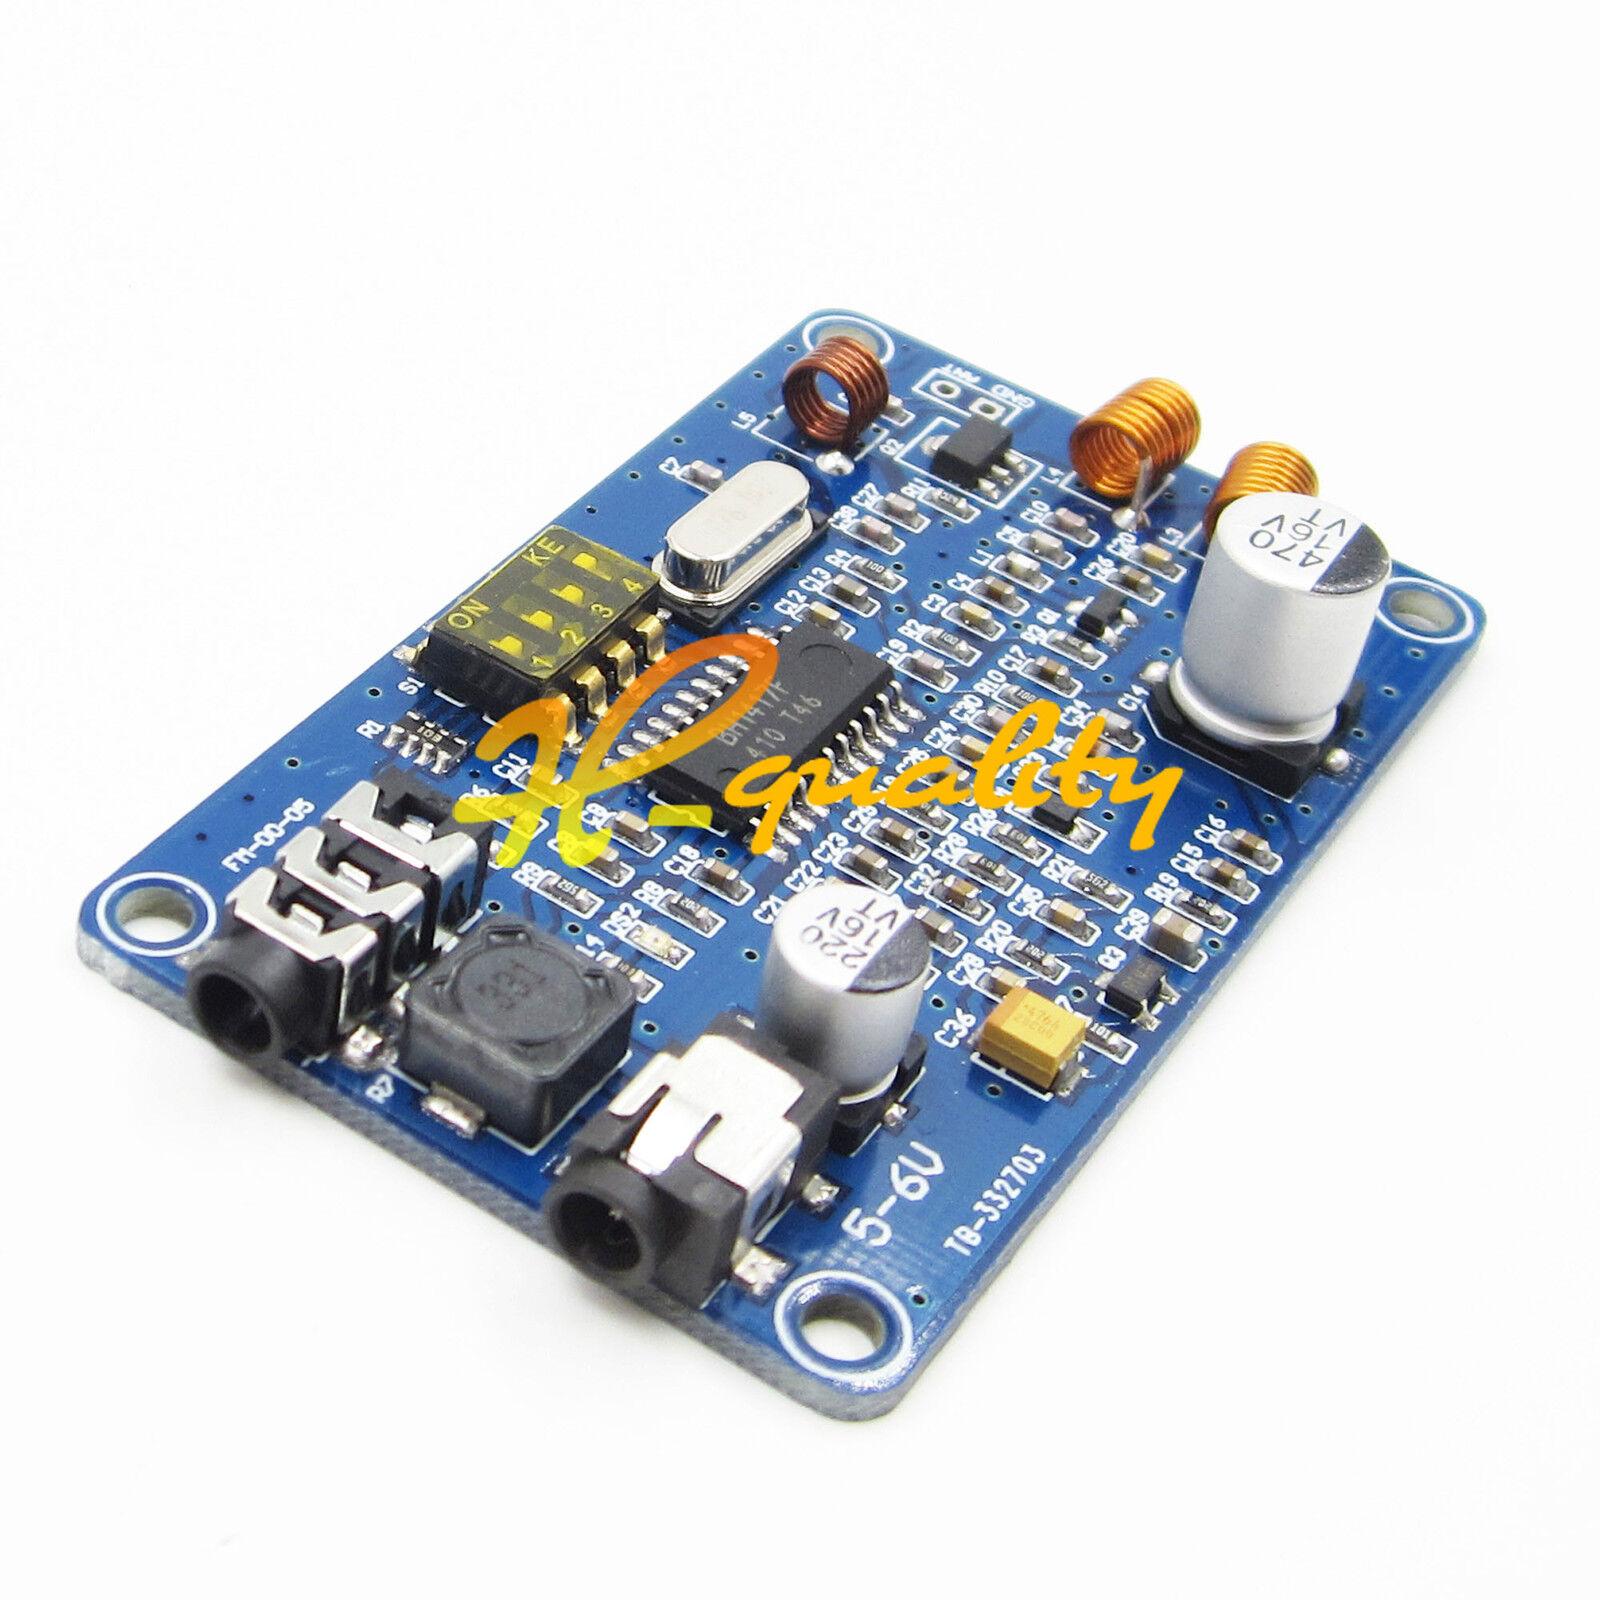 Bh1417 05w Digital Radio Station Pll Wireless Stereo Fm Transmitter Bh1417f Modulator Circuit Schematic Norton Secured Powered By Verisign